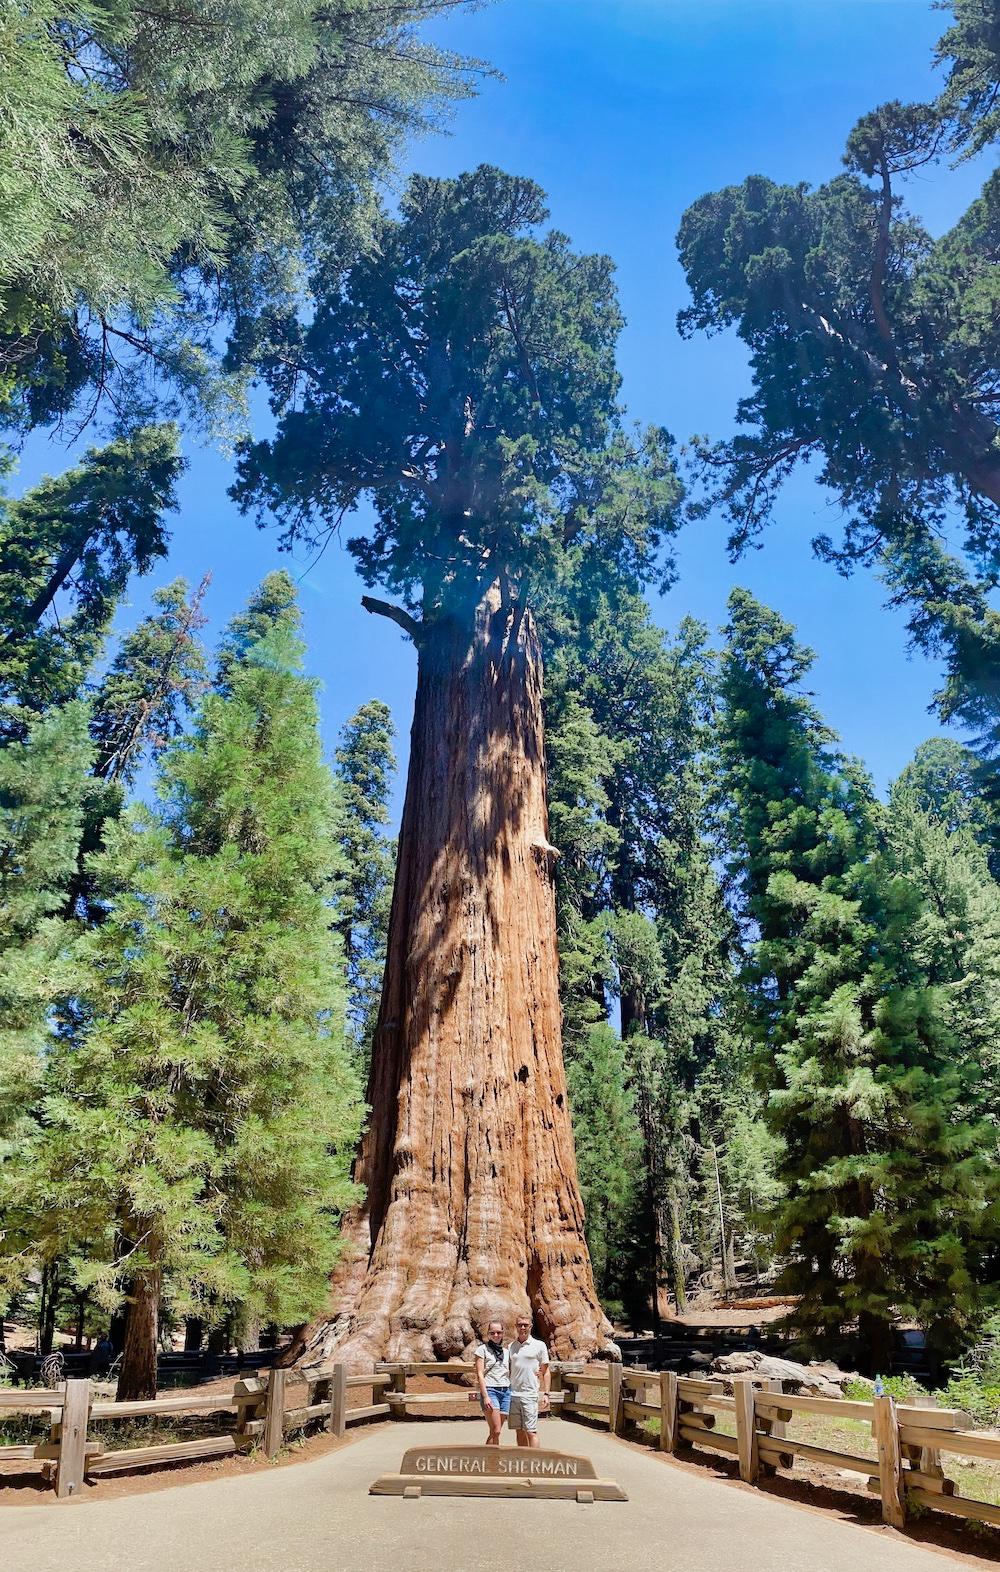 Sequoia National Park - General Sherman Tree